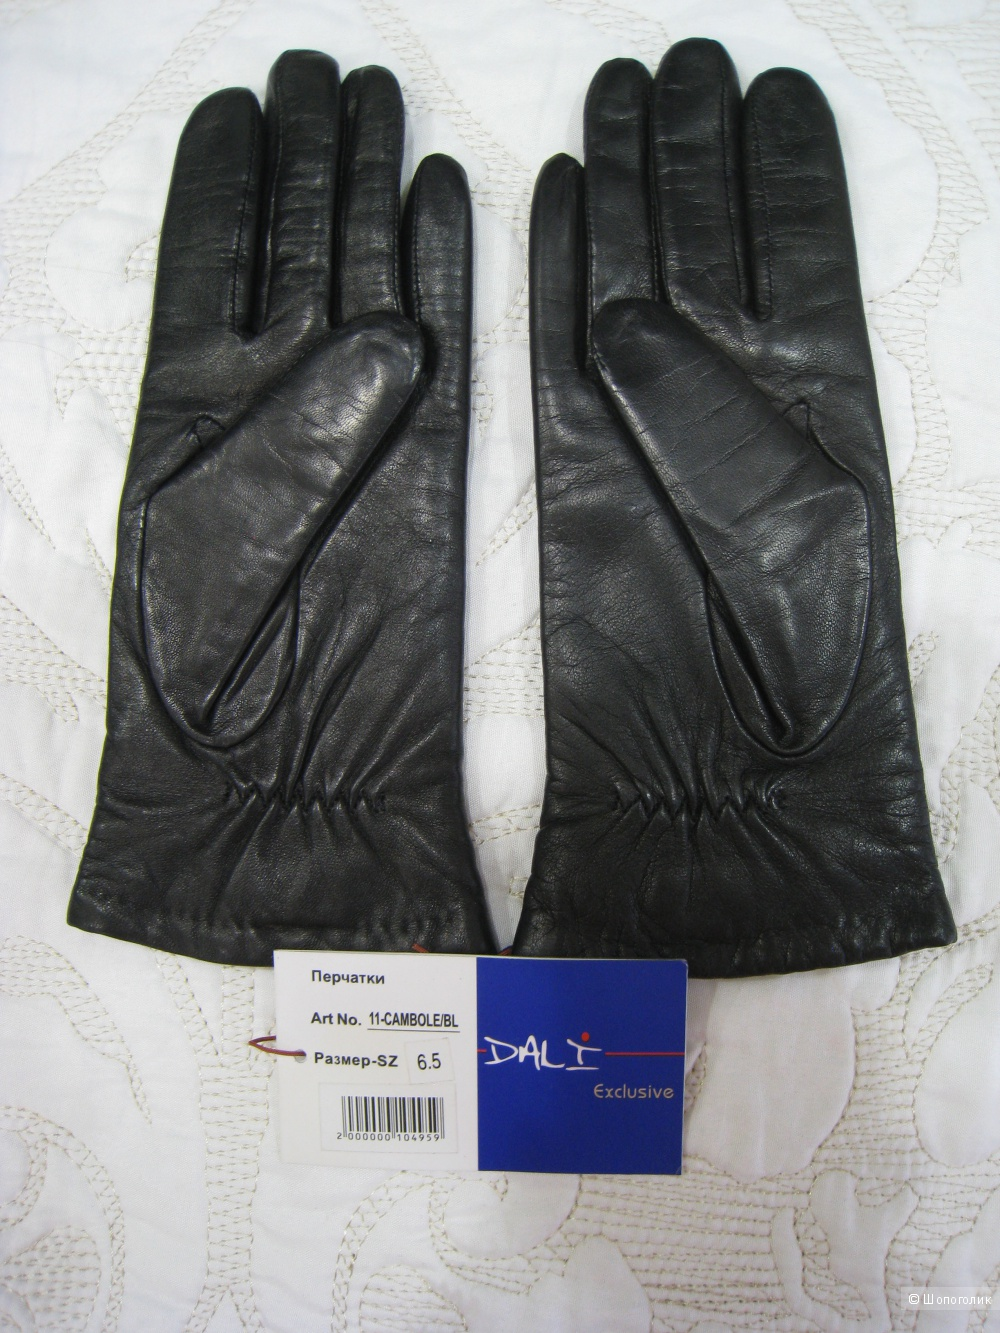 Перчатки из кожи ягненка DALI Exclusive, 6.5